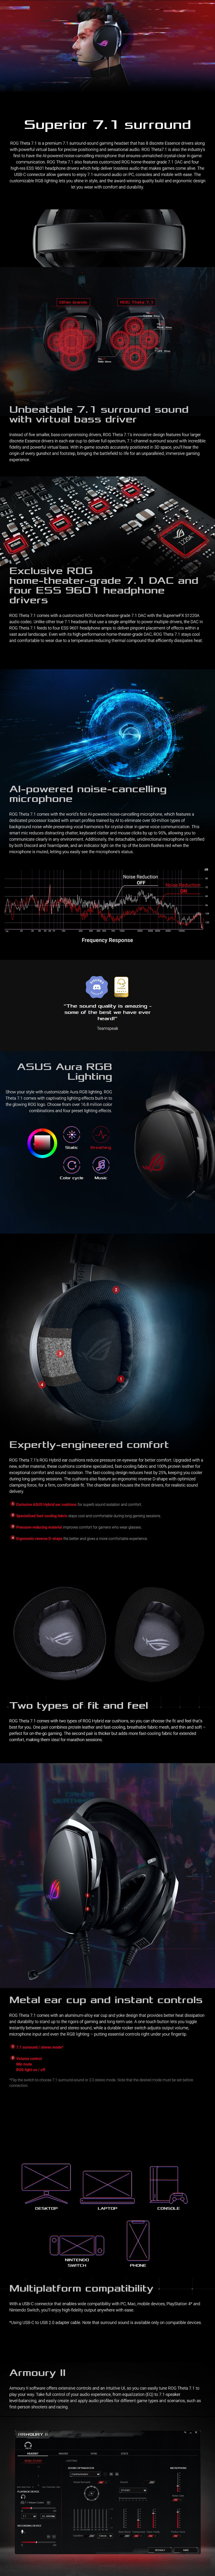 asus-rog-theta-71-usbc-gaming-headset-ac31967-6.jpg